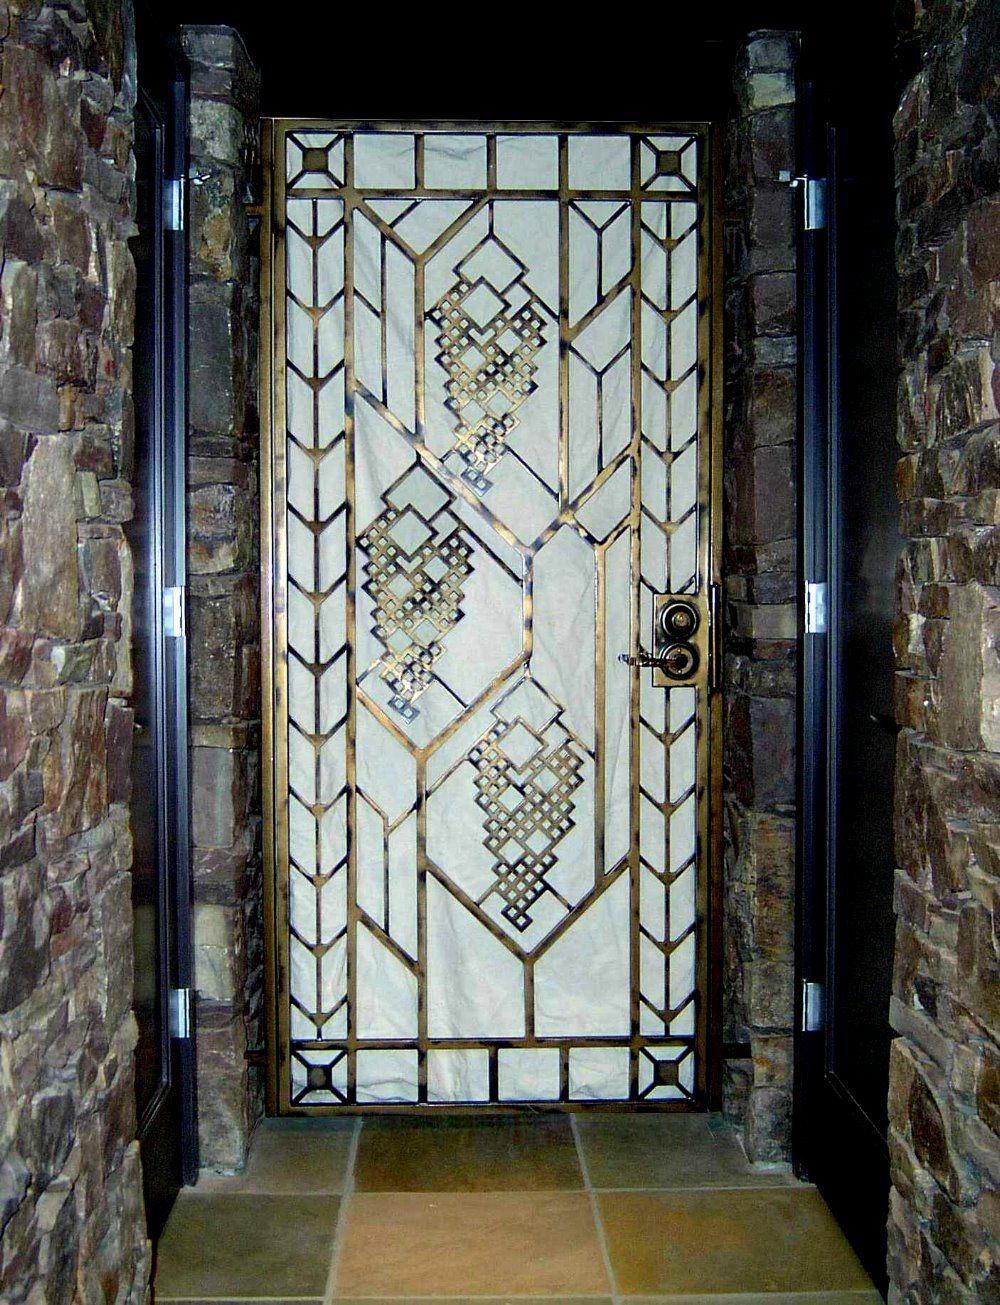 Ironwork Frank Lloyd Wright Inspired Wine Cellar Gate